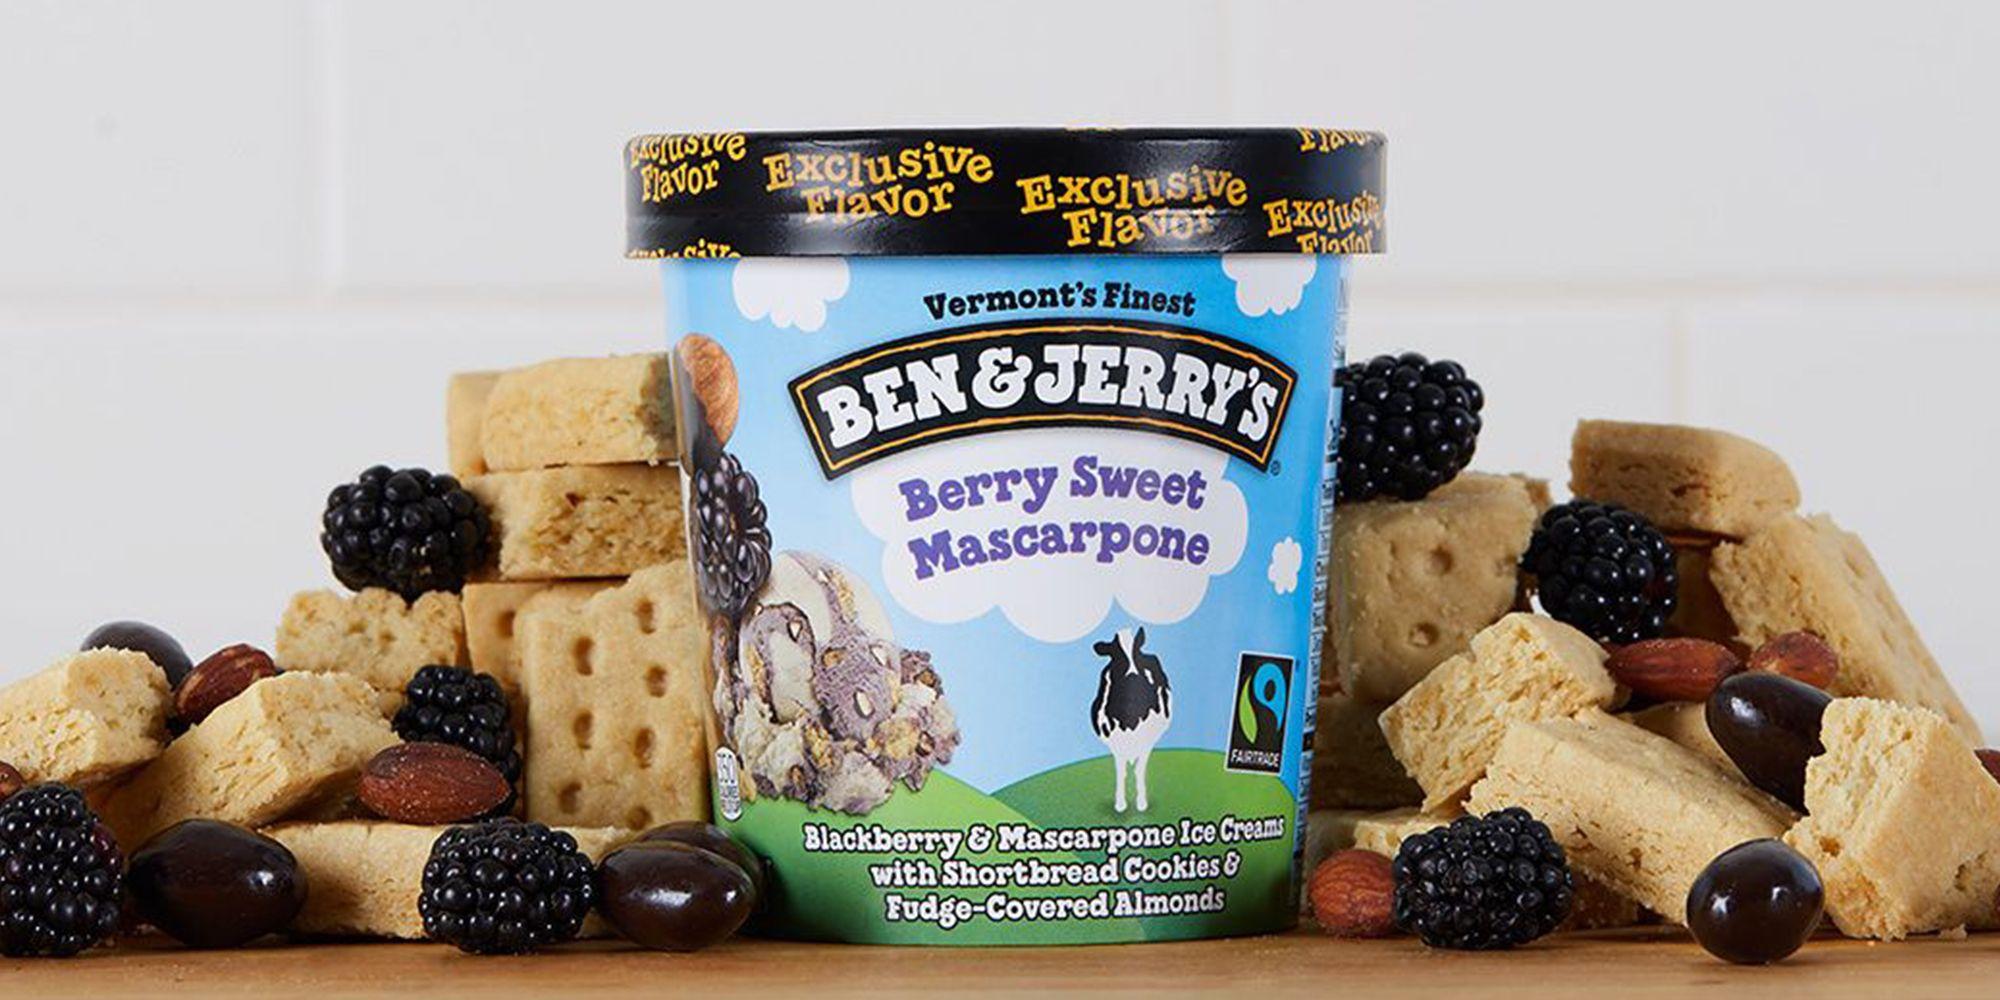 Ben & Jerry's New Pint Combines Blackberry And Mascarpone Ice Creams